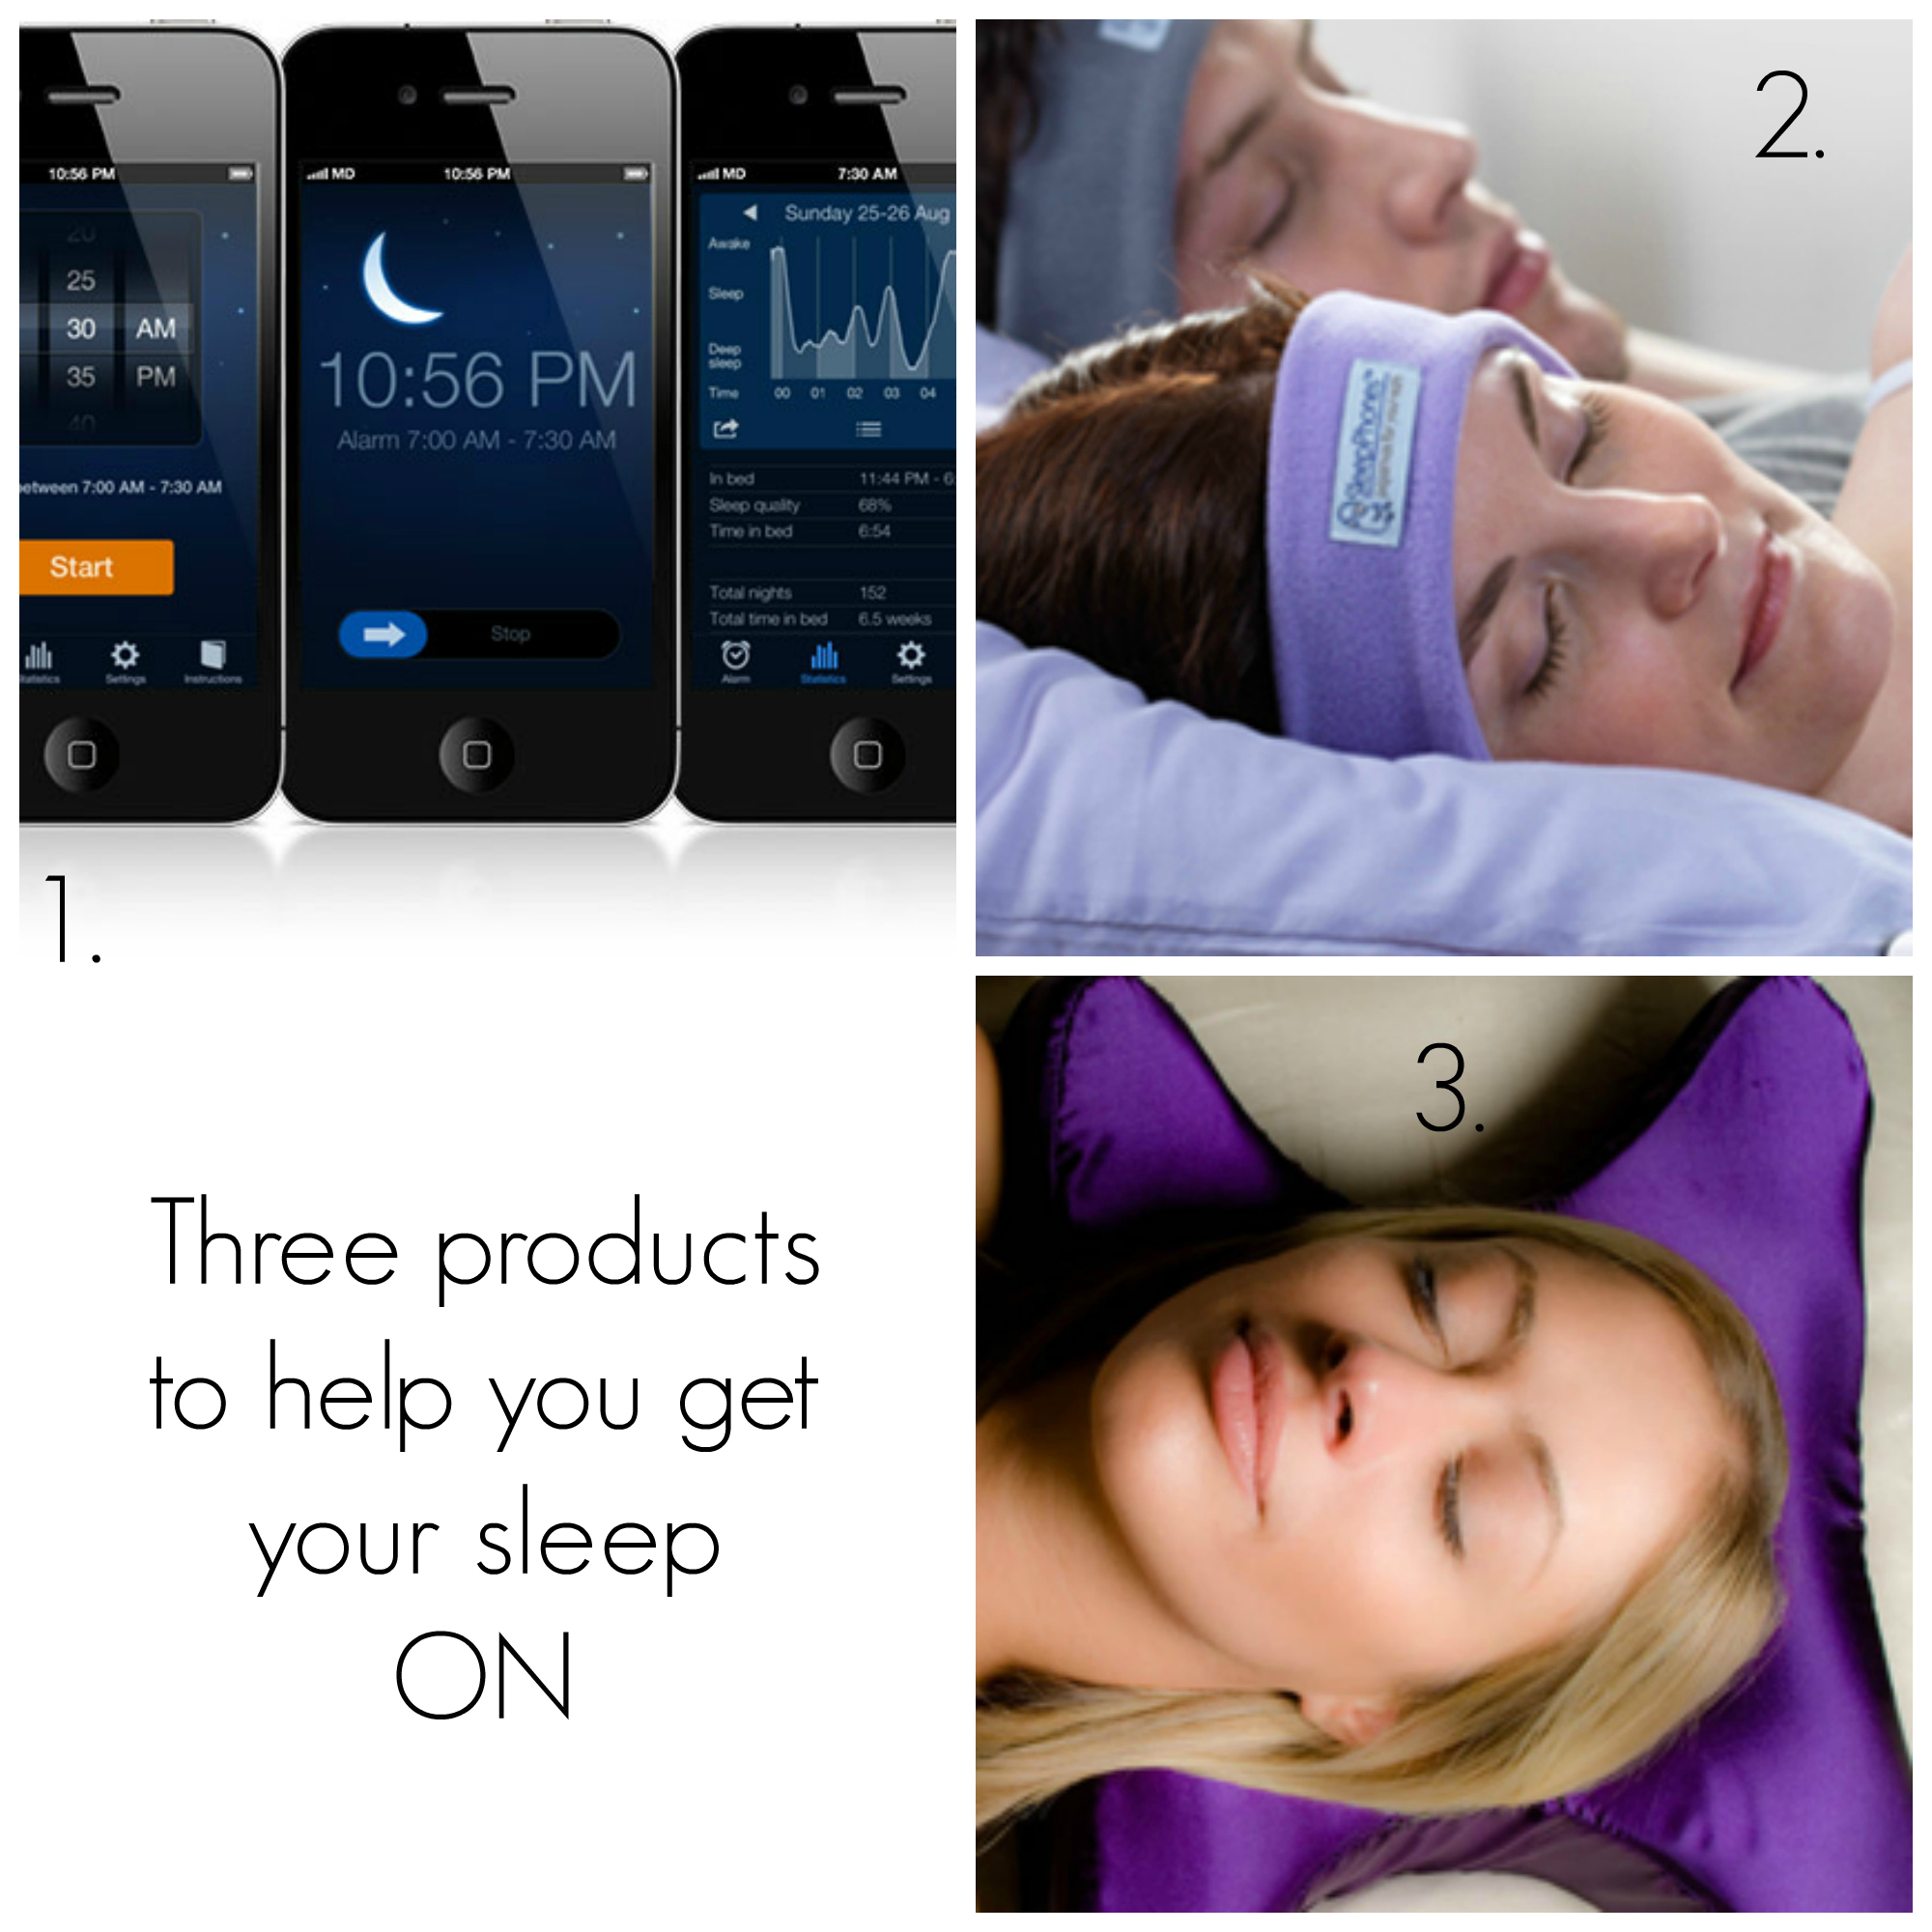 Get Better Sleep. how to sleep better, Tips on getting a better night's sleep